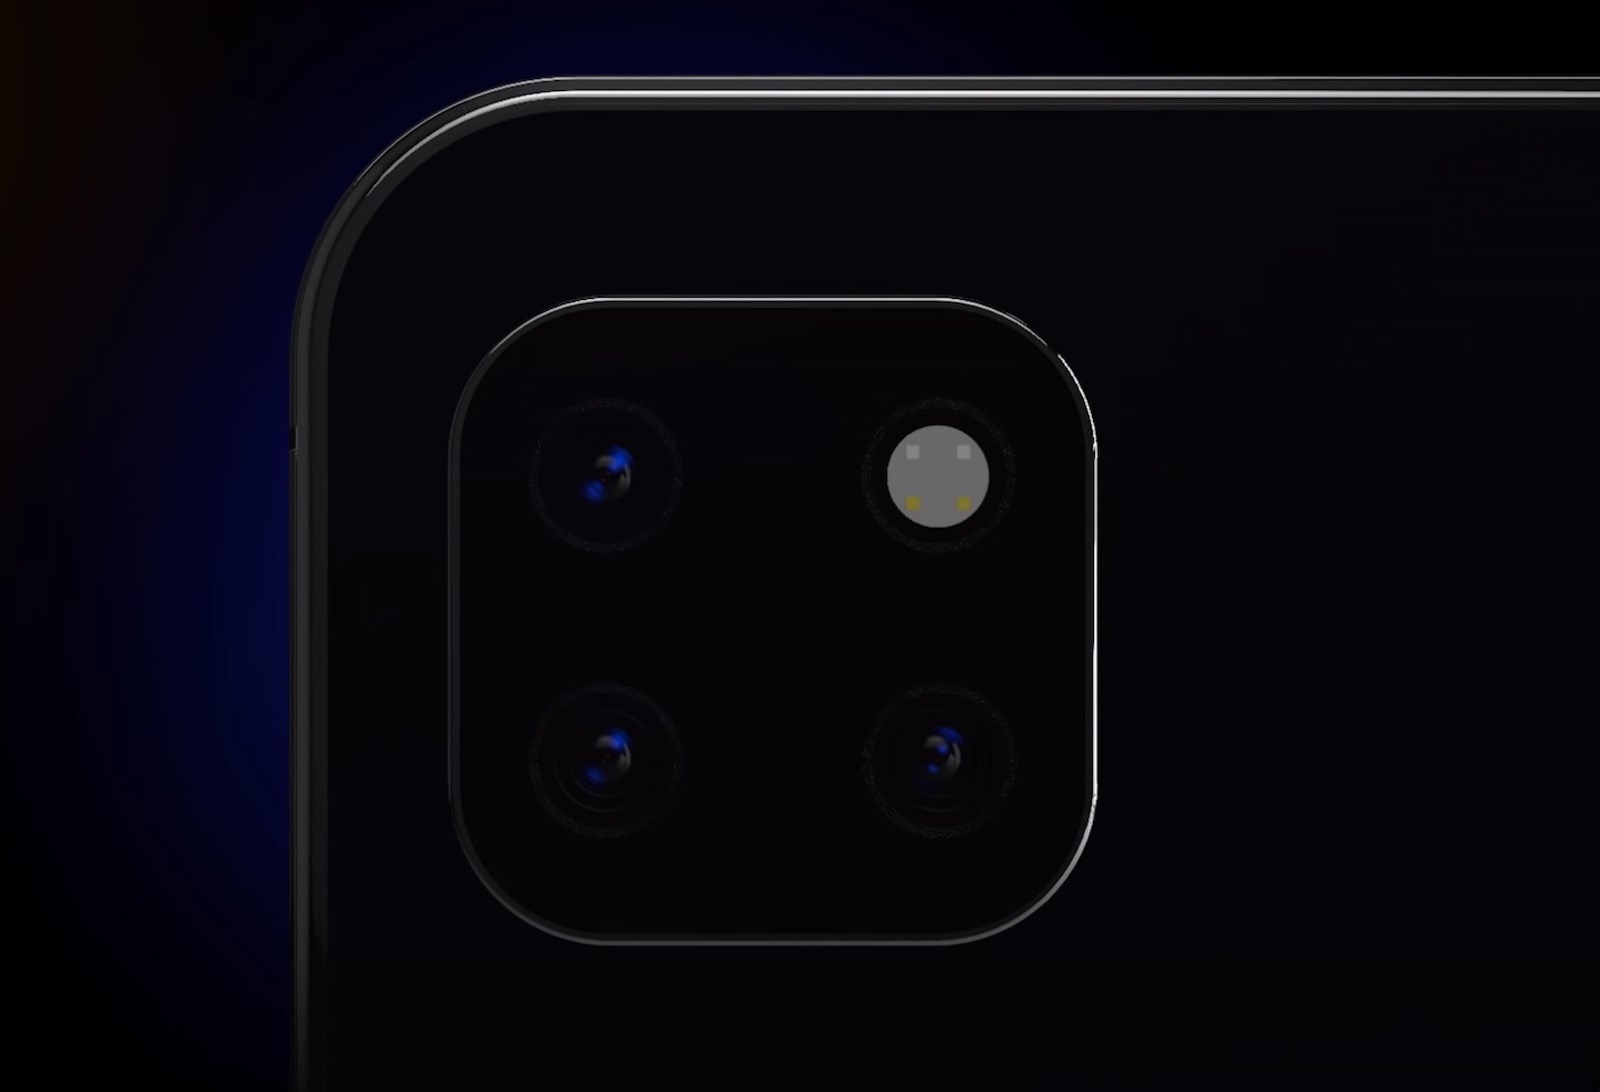 Triple Lens Camera Unit for iPhone Concept